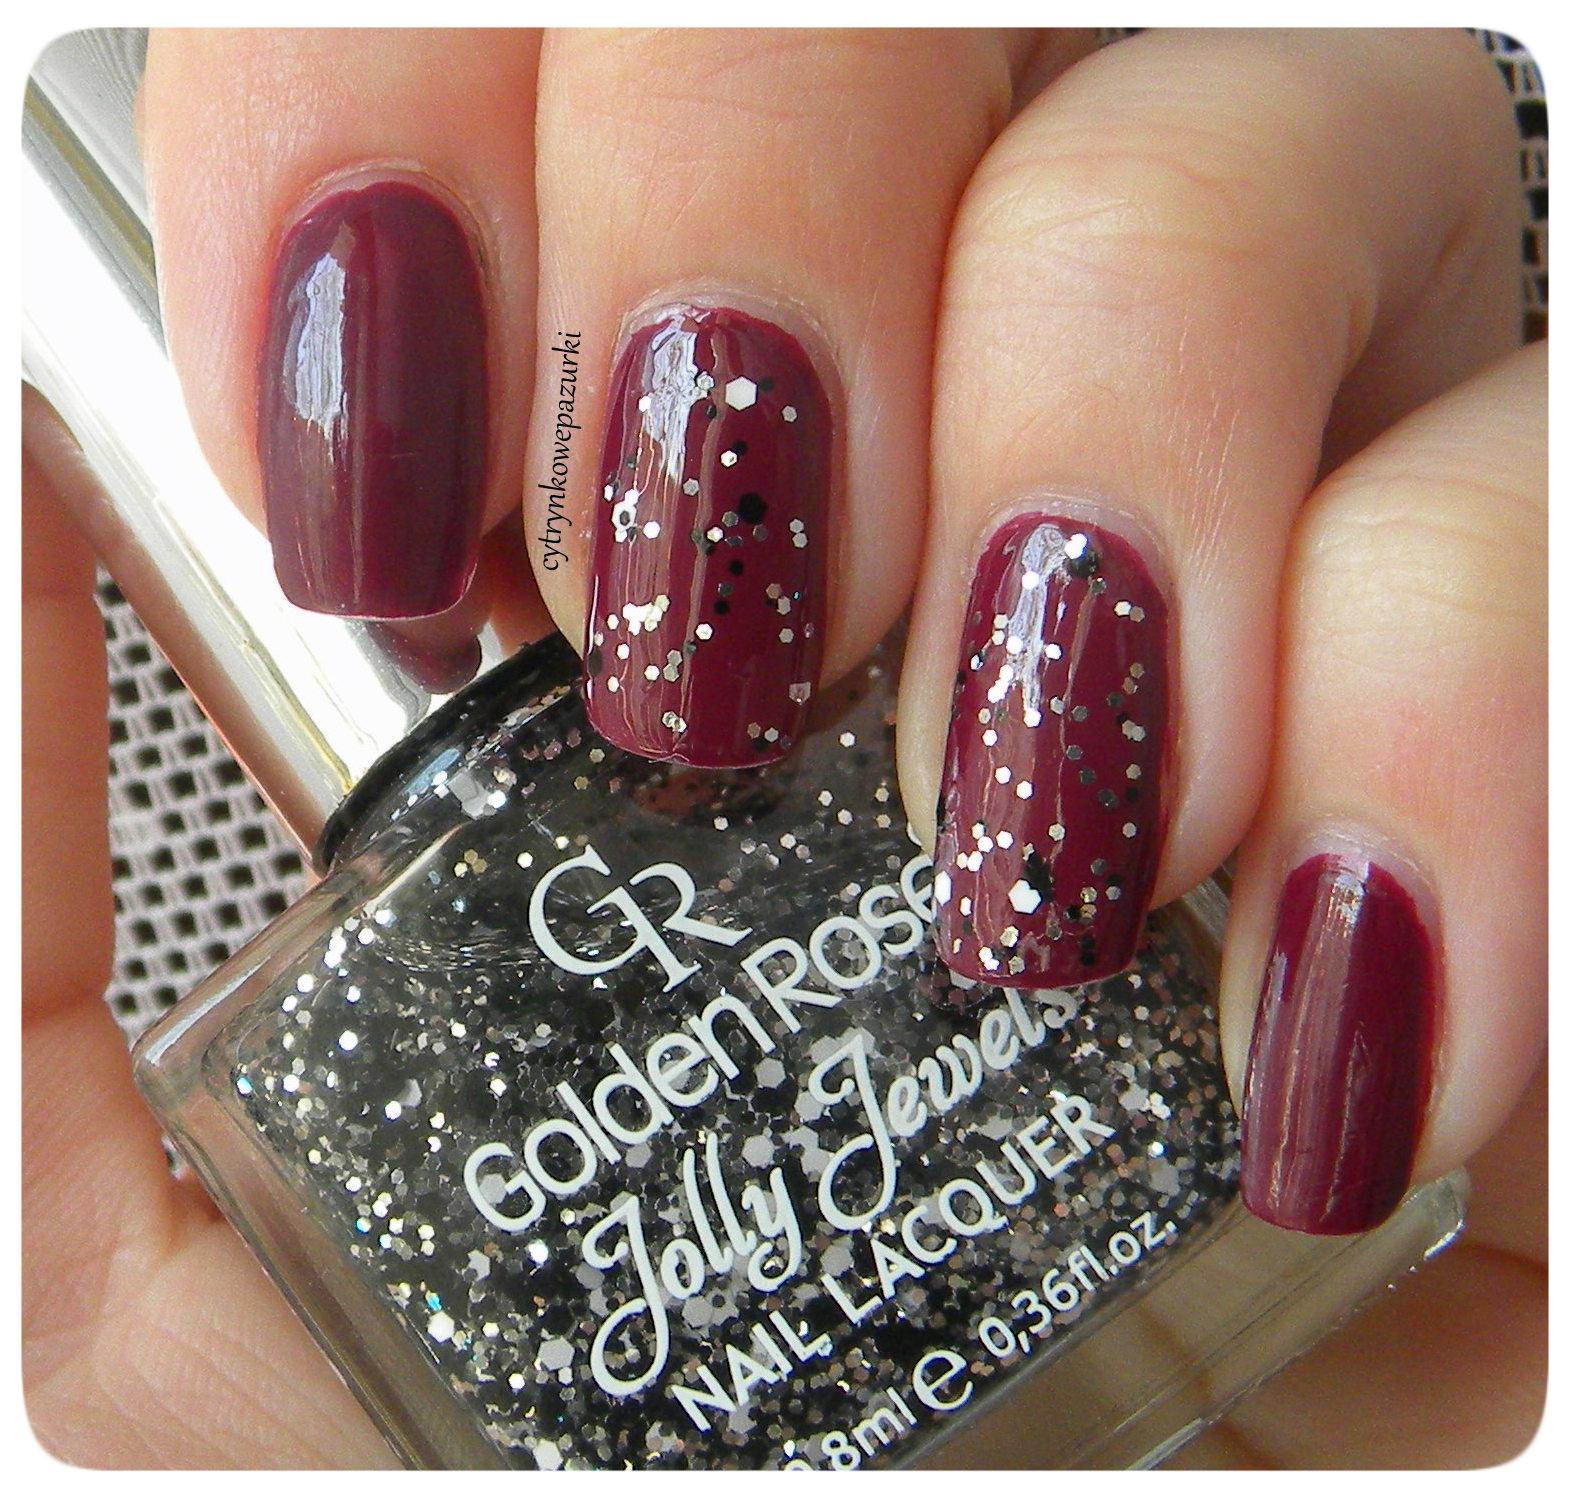 Golden Rose Rich Color 28 i Jolly Jewels 118